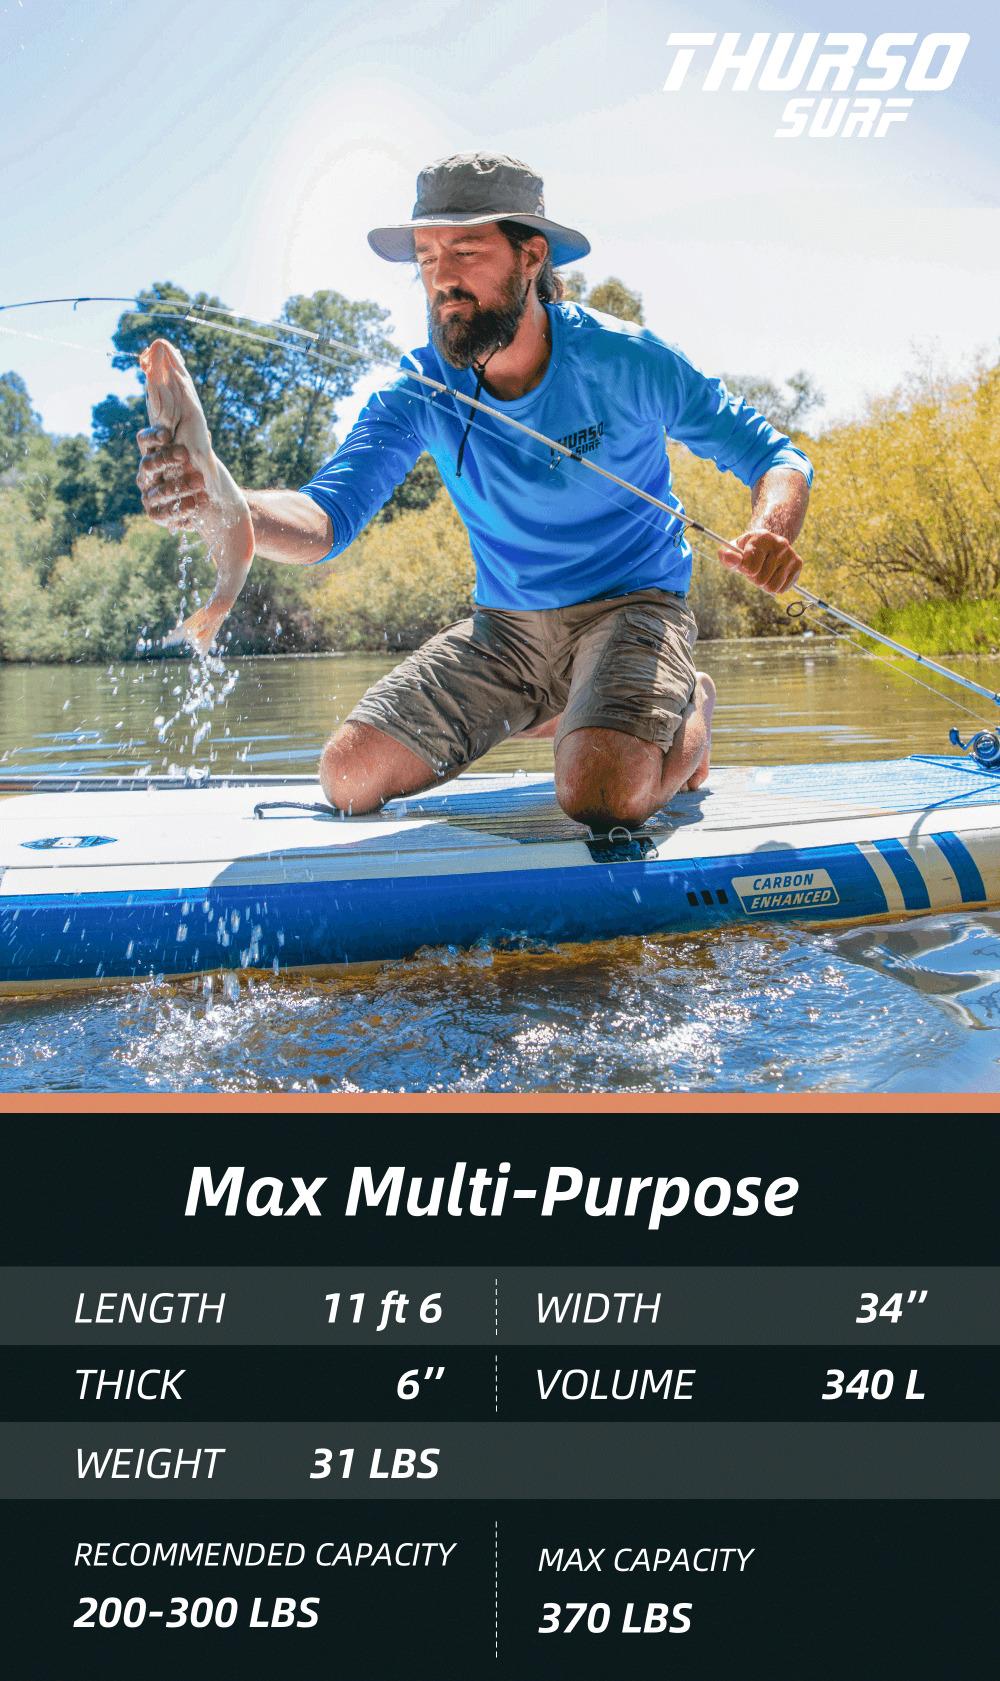 Thurso-Surf-Max-138-2021-specs-mobile